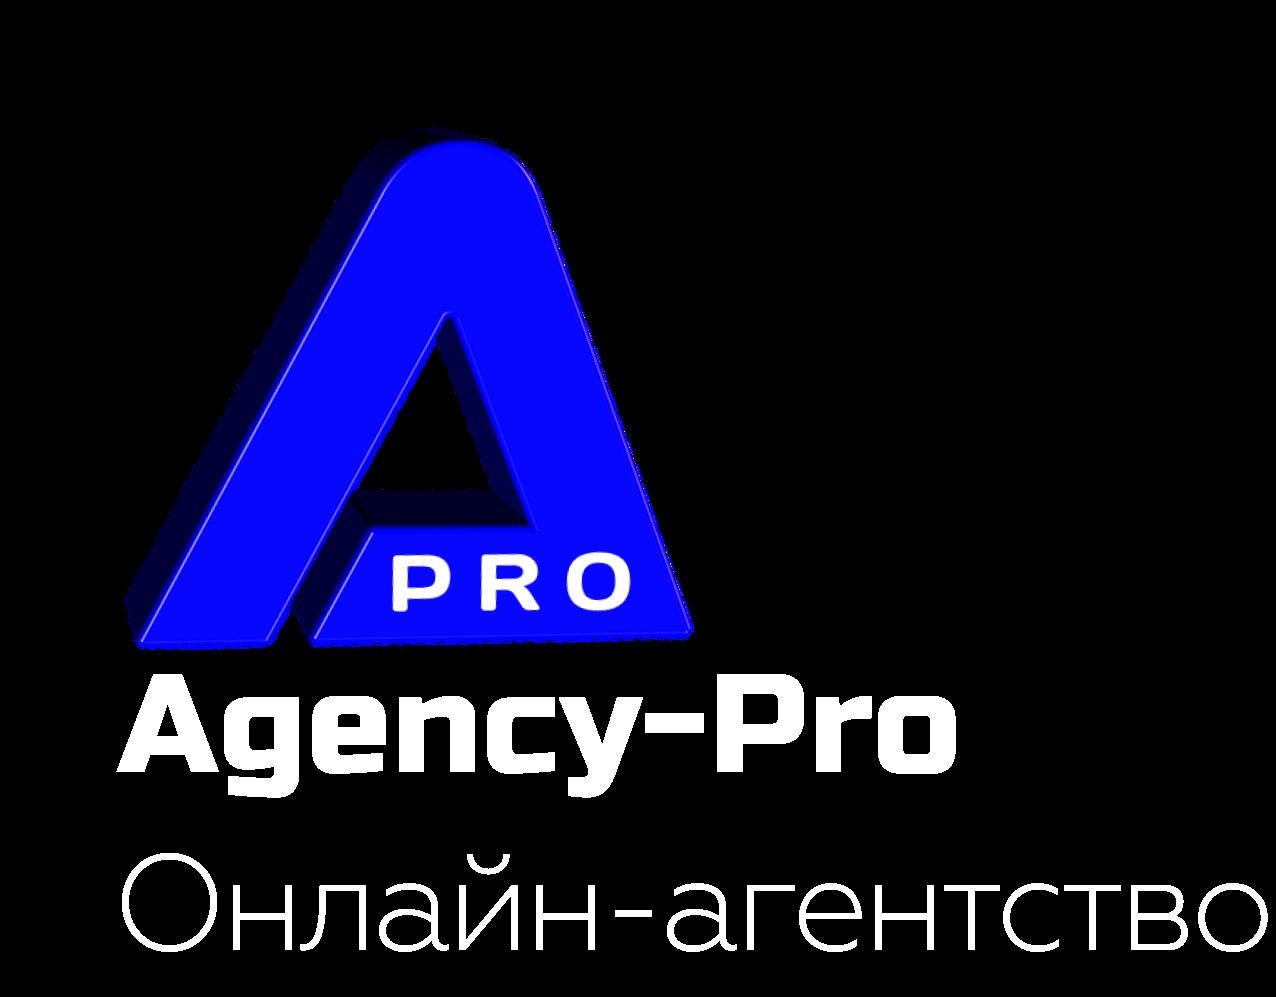 Онлайн-агентство